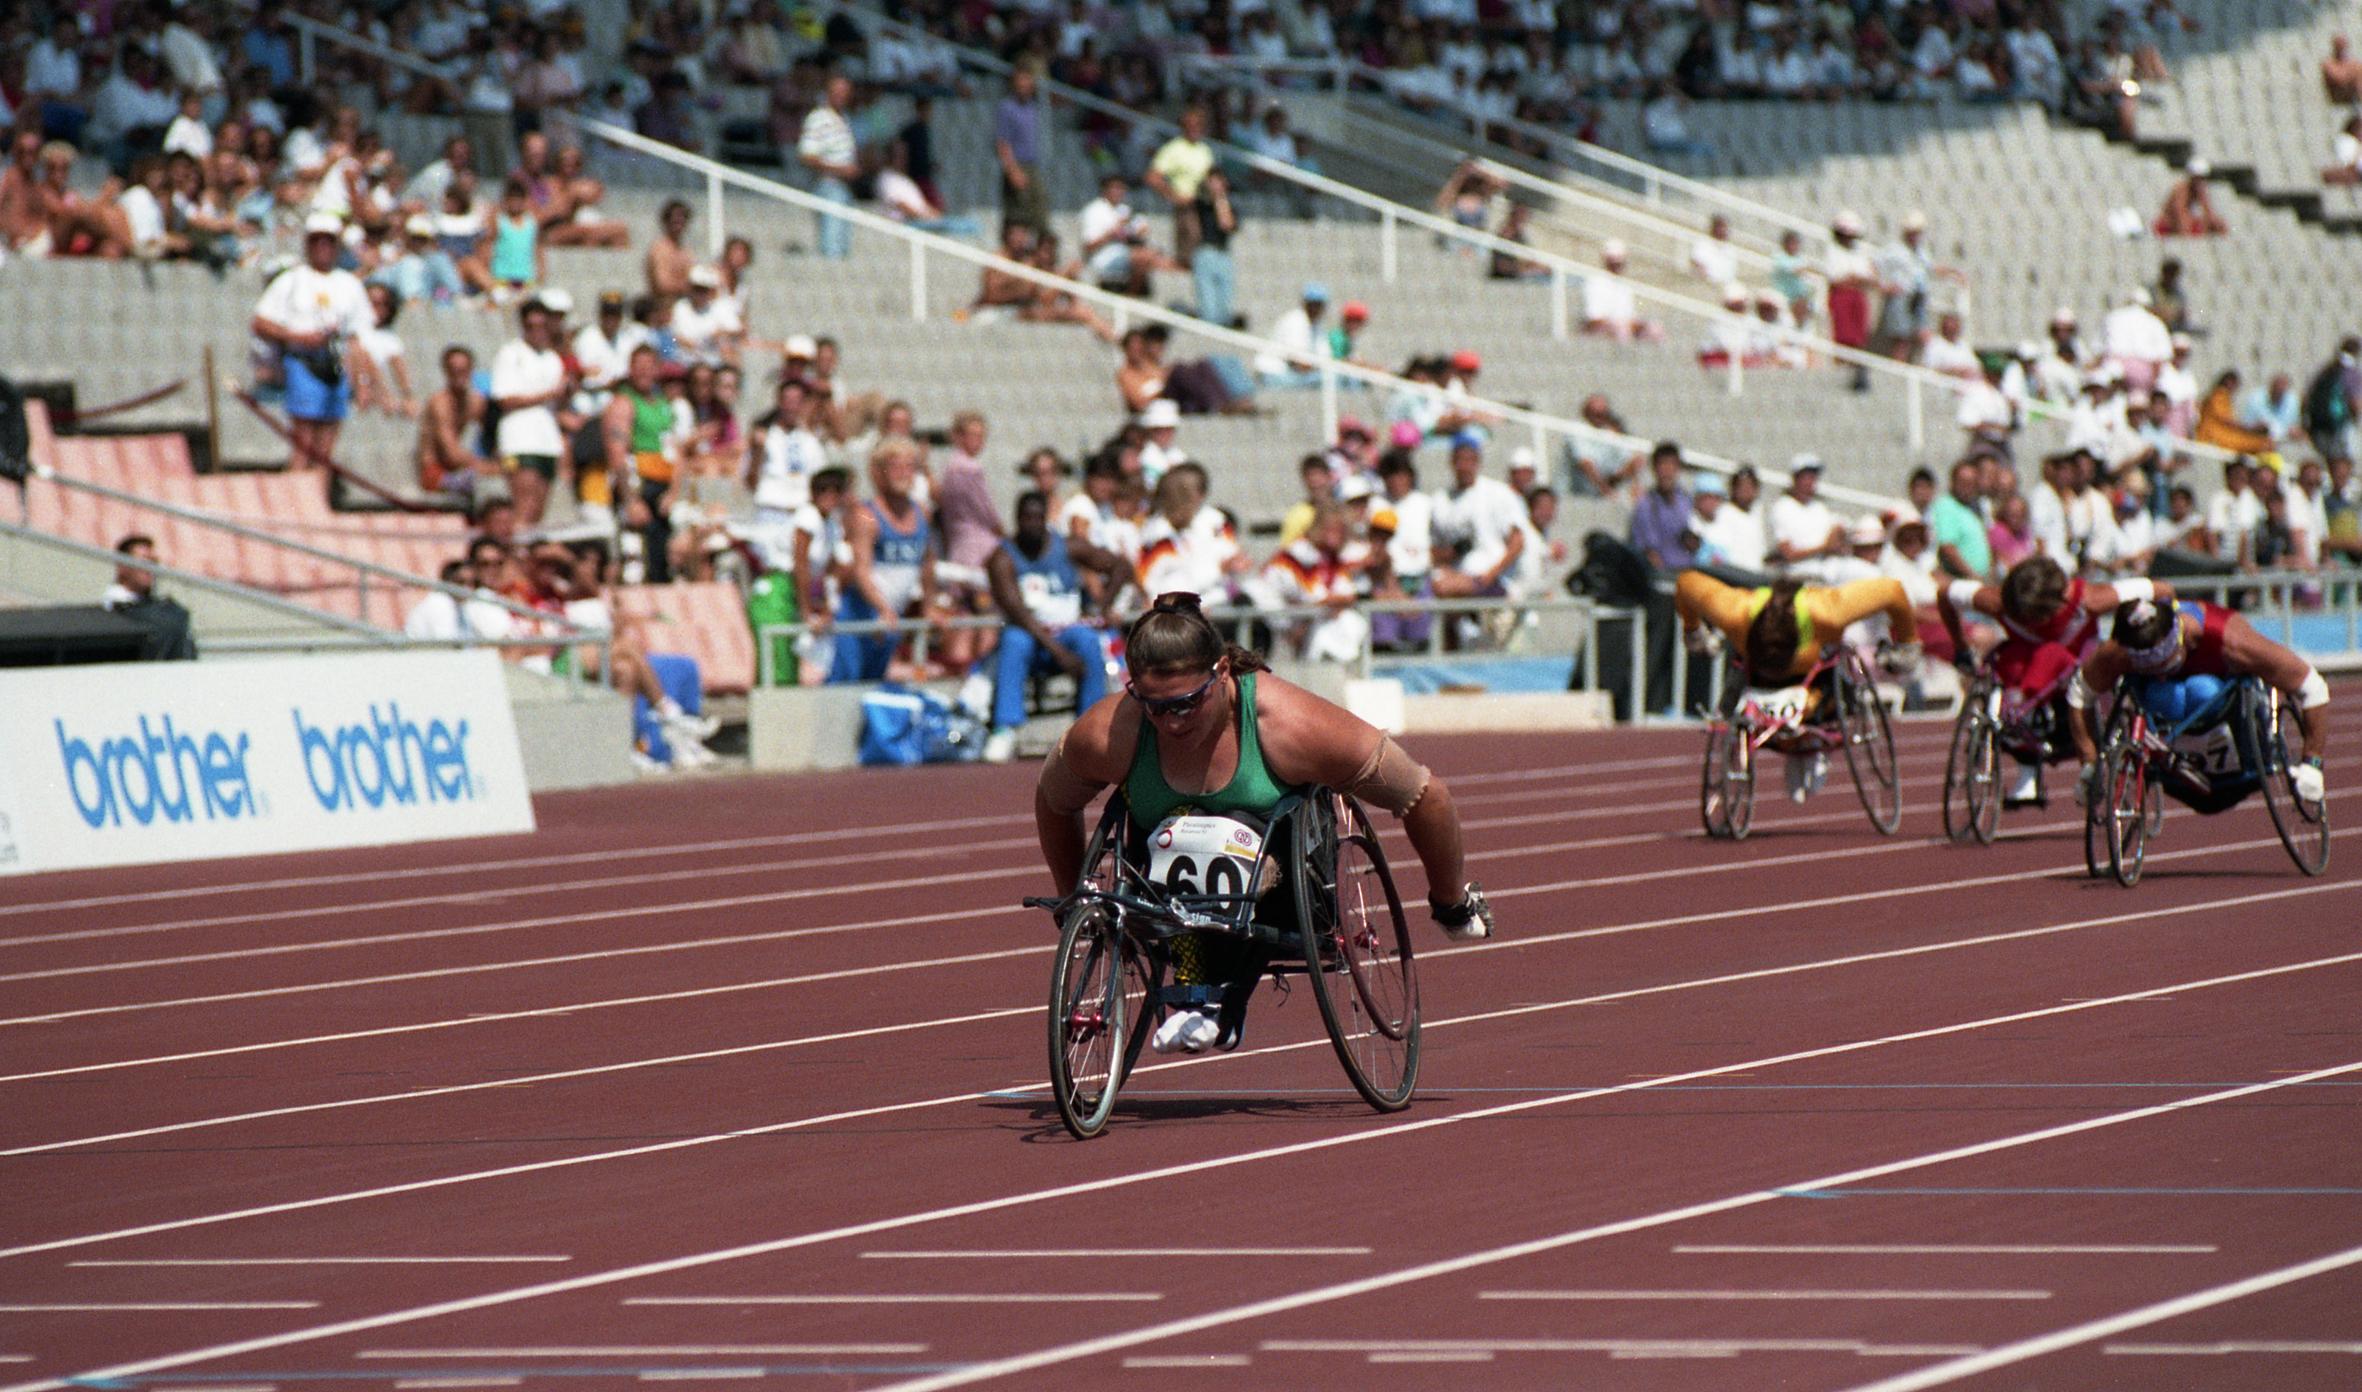 wheelchair used hampton bay swivel patio chairs file:louise sauvage, race, 1992 paralympics.jpg - wikimedia commons